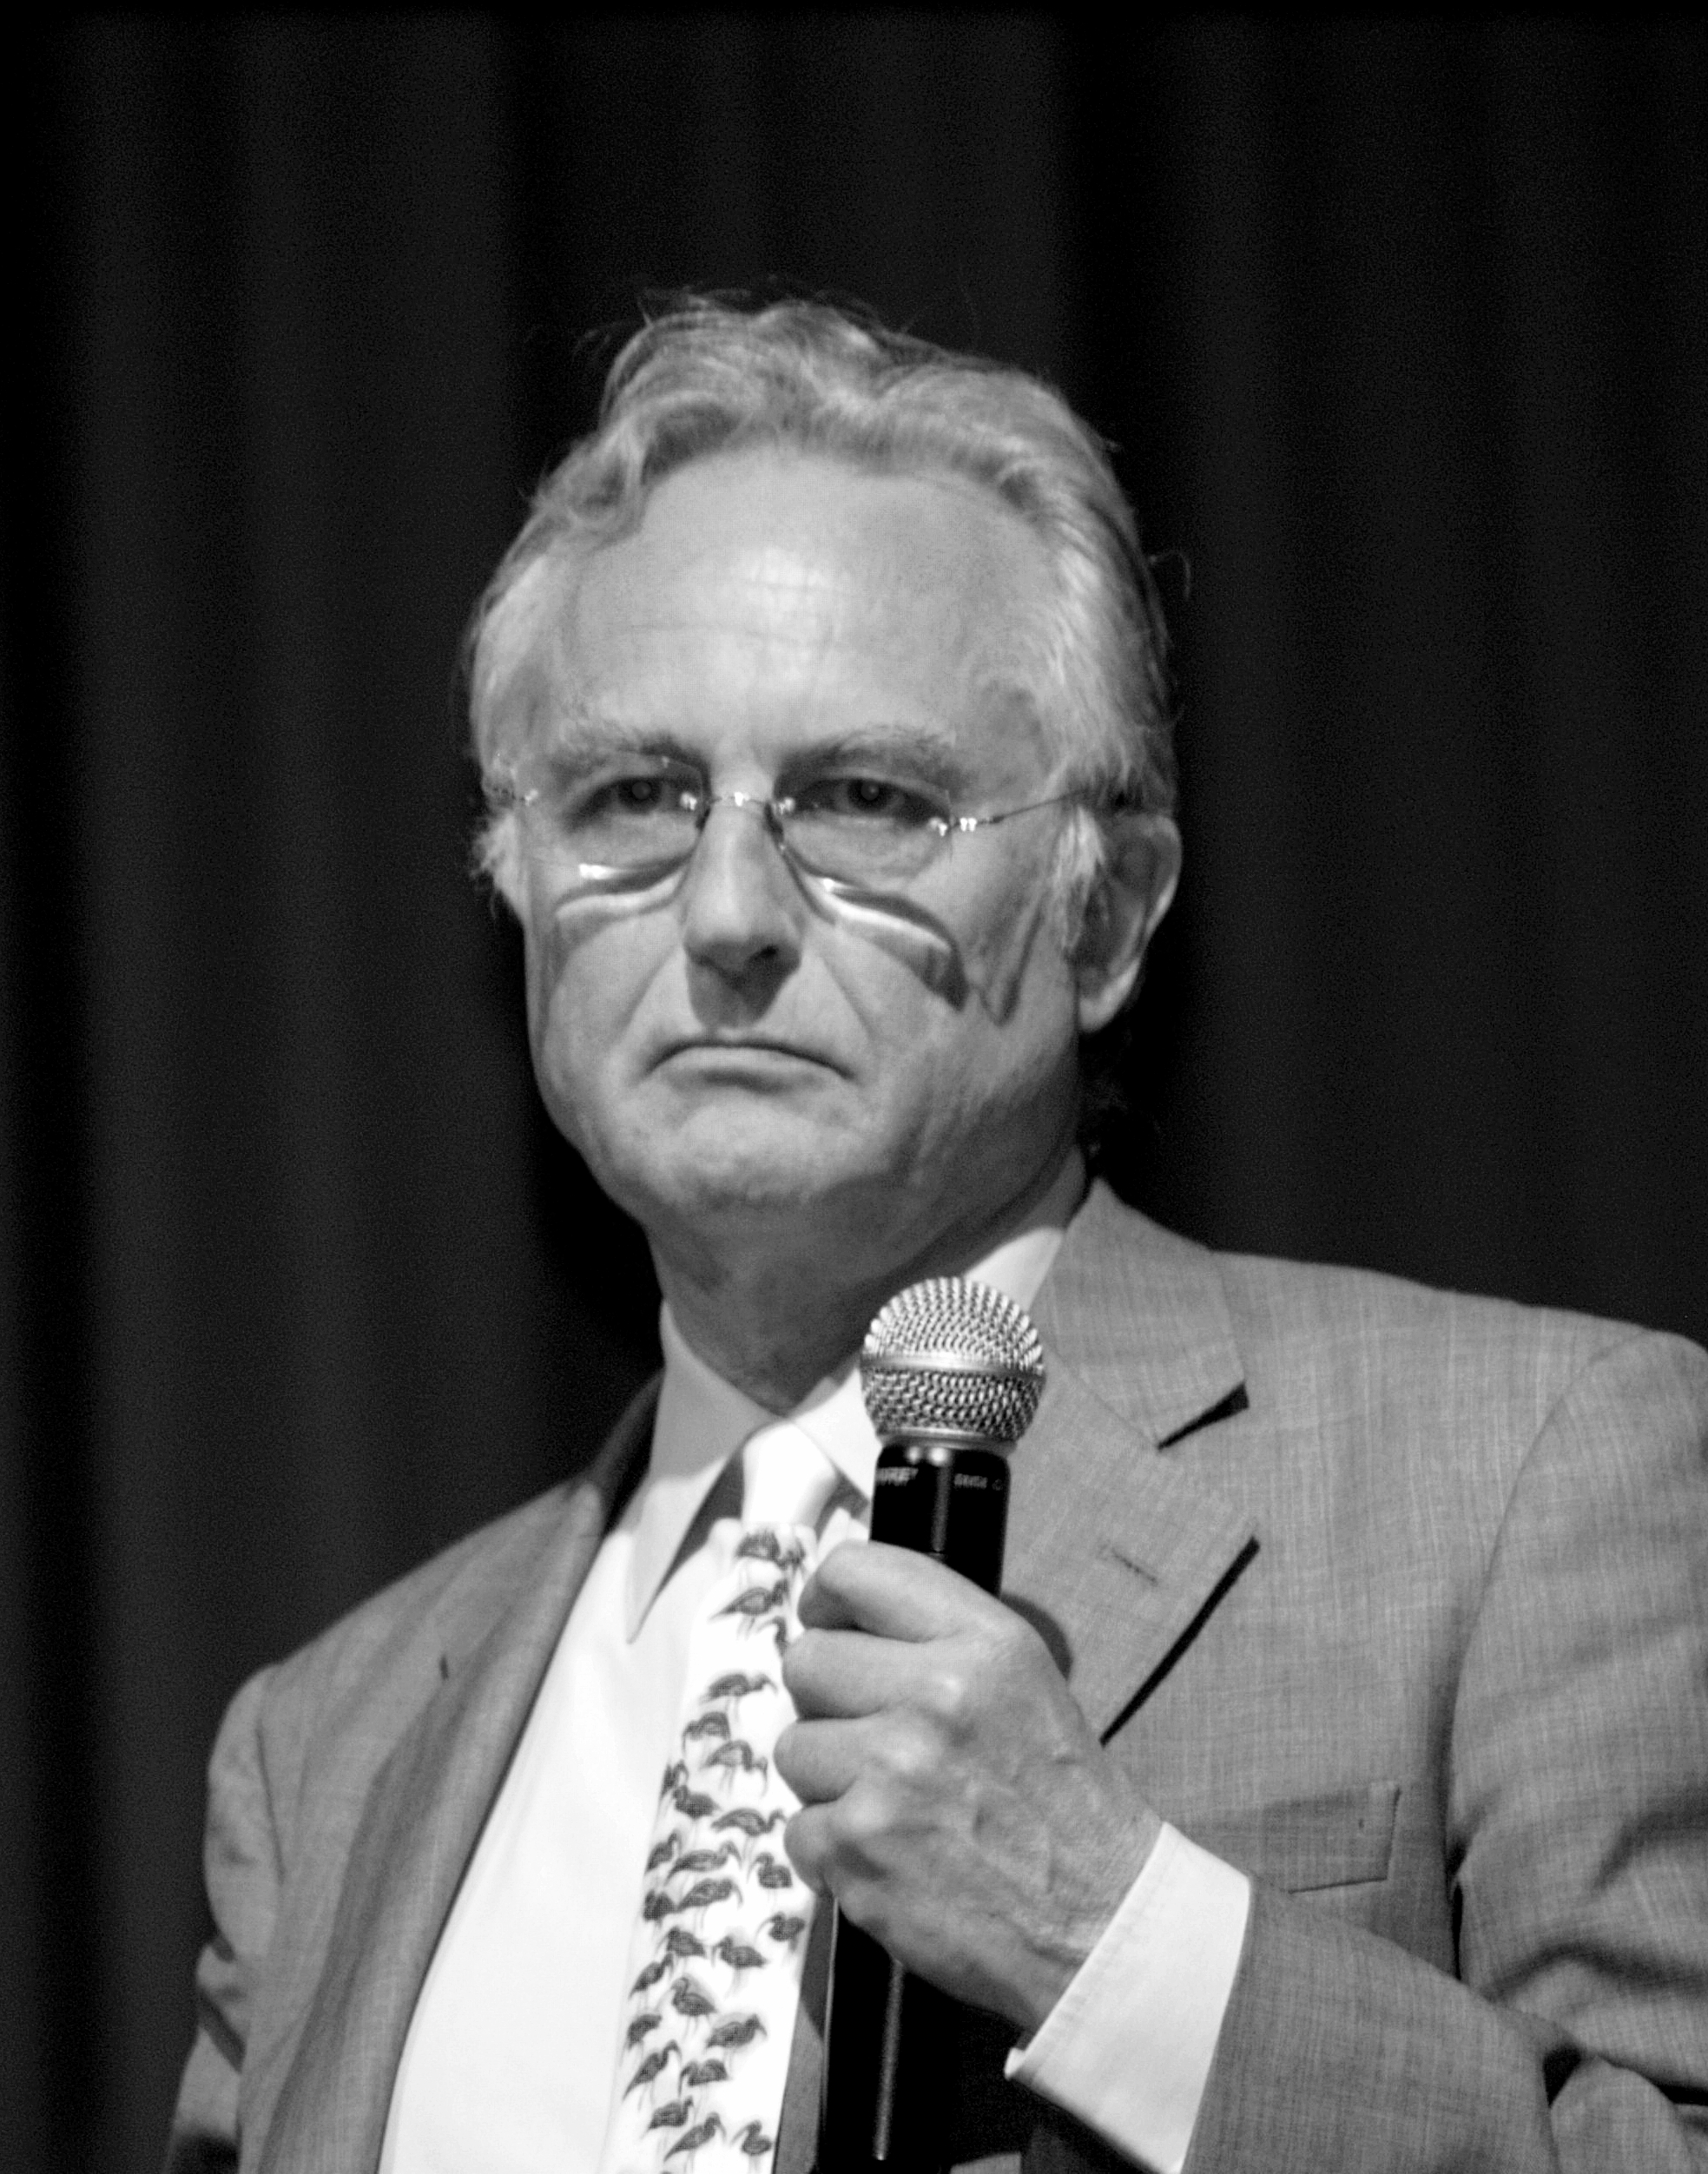 filerichard dawkins darwins rottweiler bwjpg wikimedia